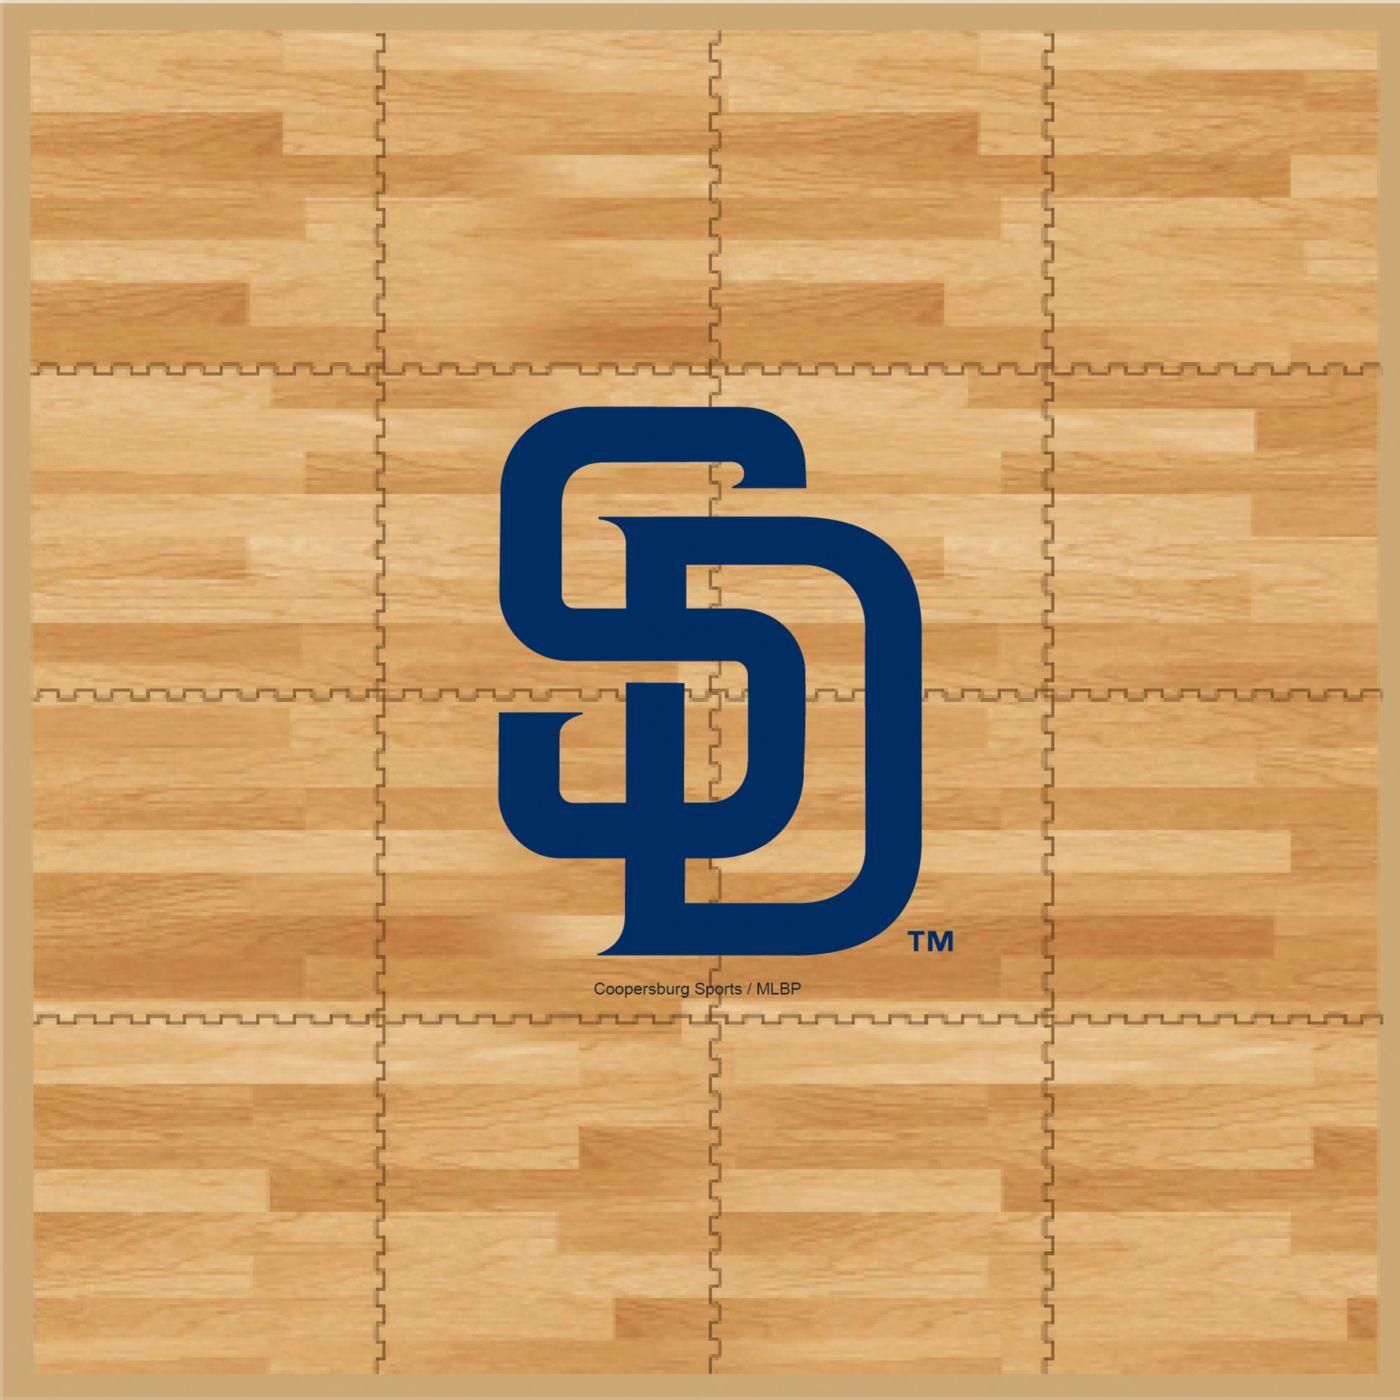 Coopersburg Sports San Diego Padres Fan Floor